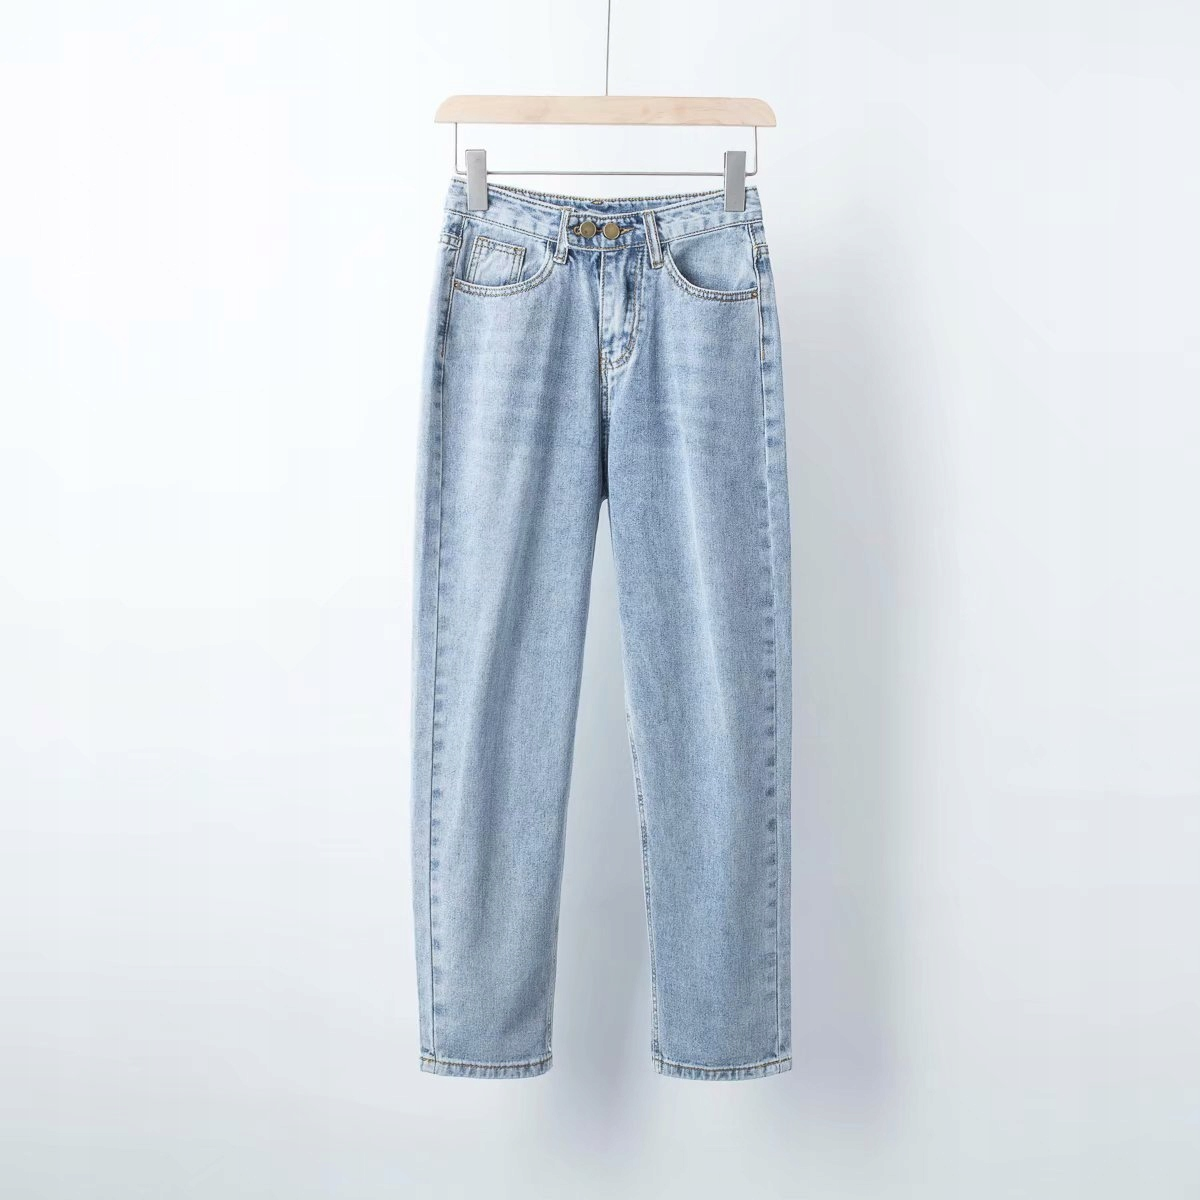 retro riflové nohavice Dámske nohavice